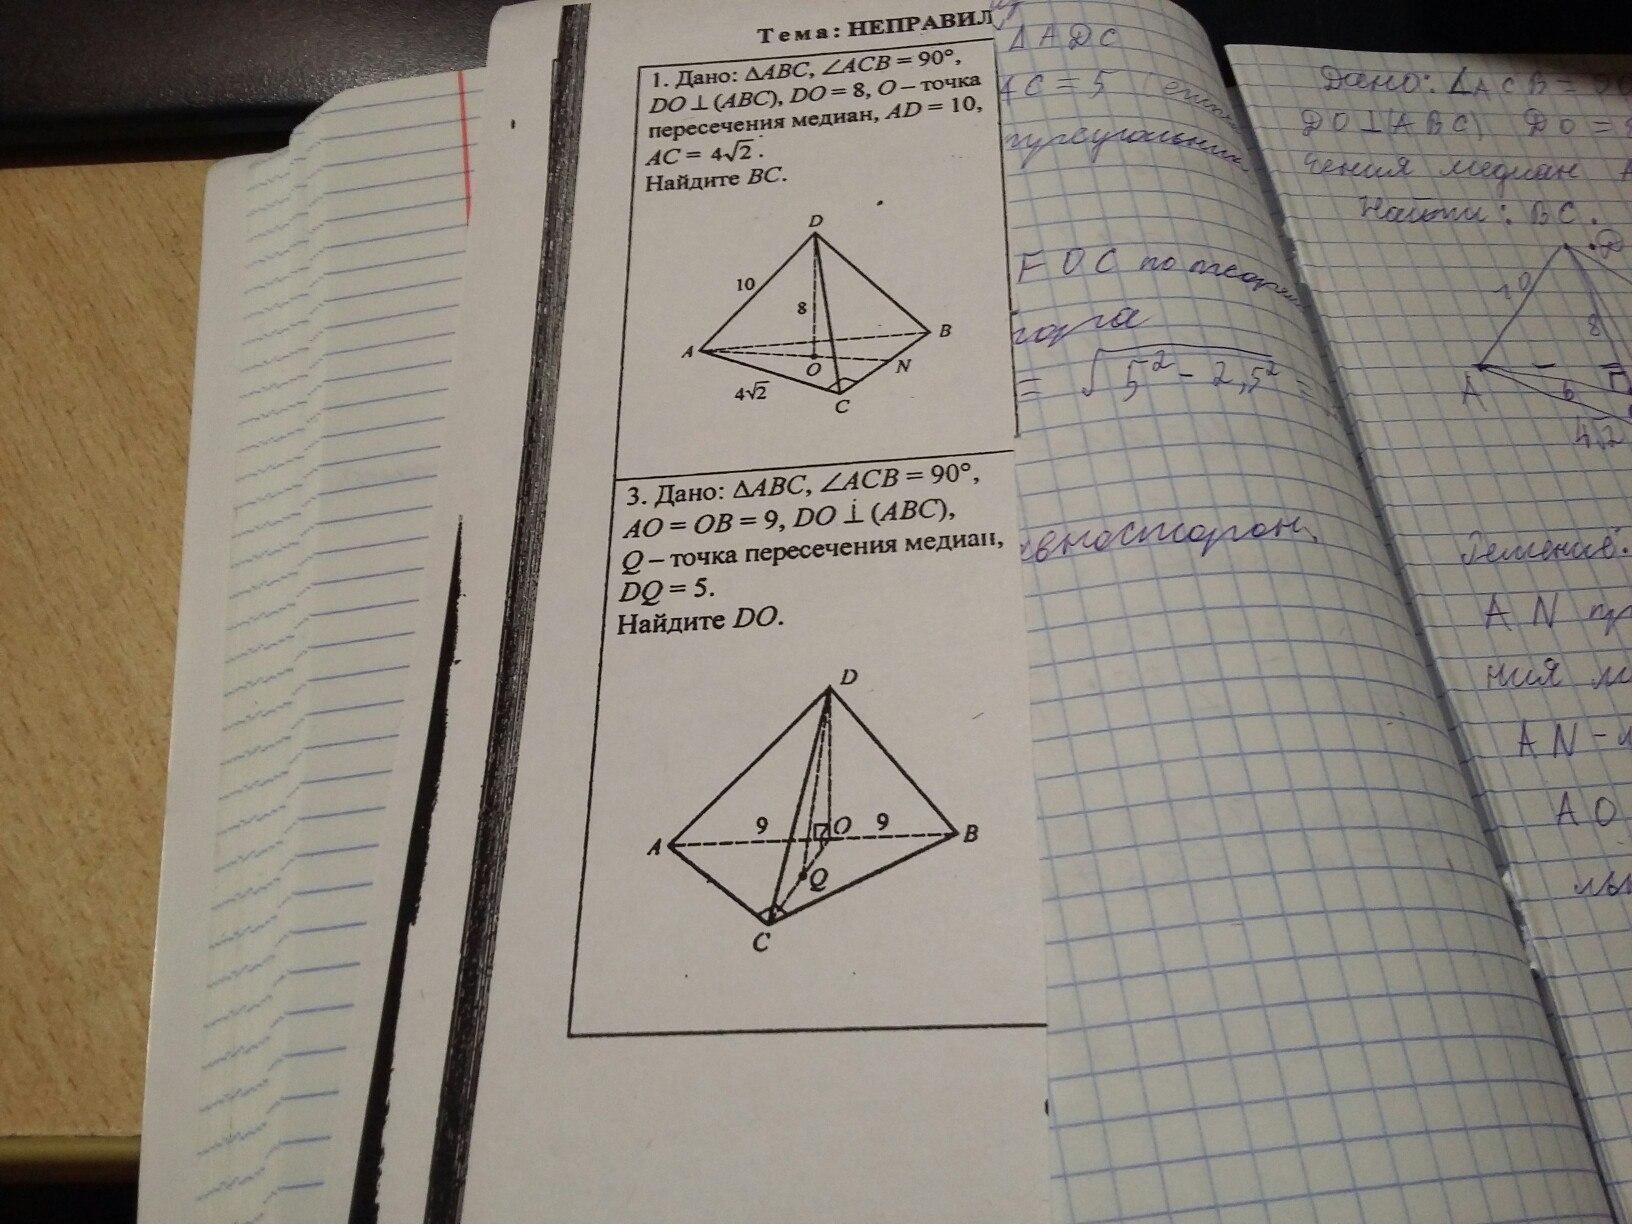 Нужна помощь по геометрии срочно!